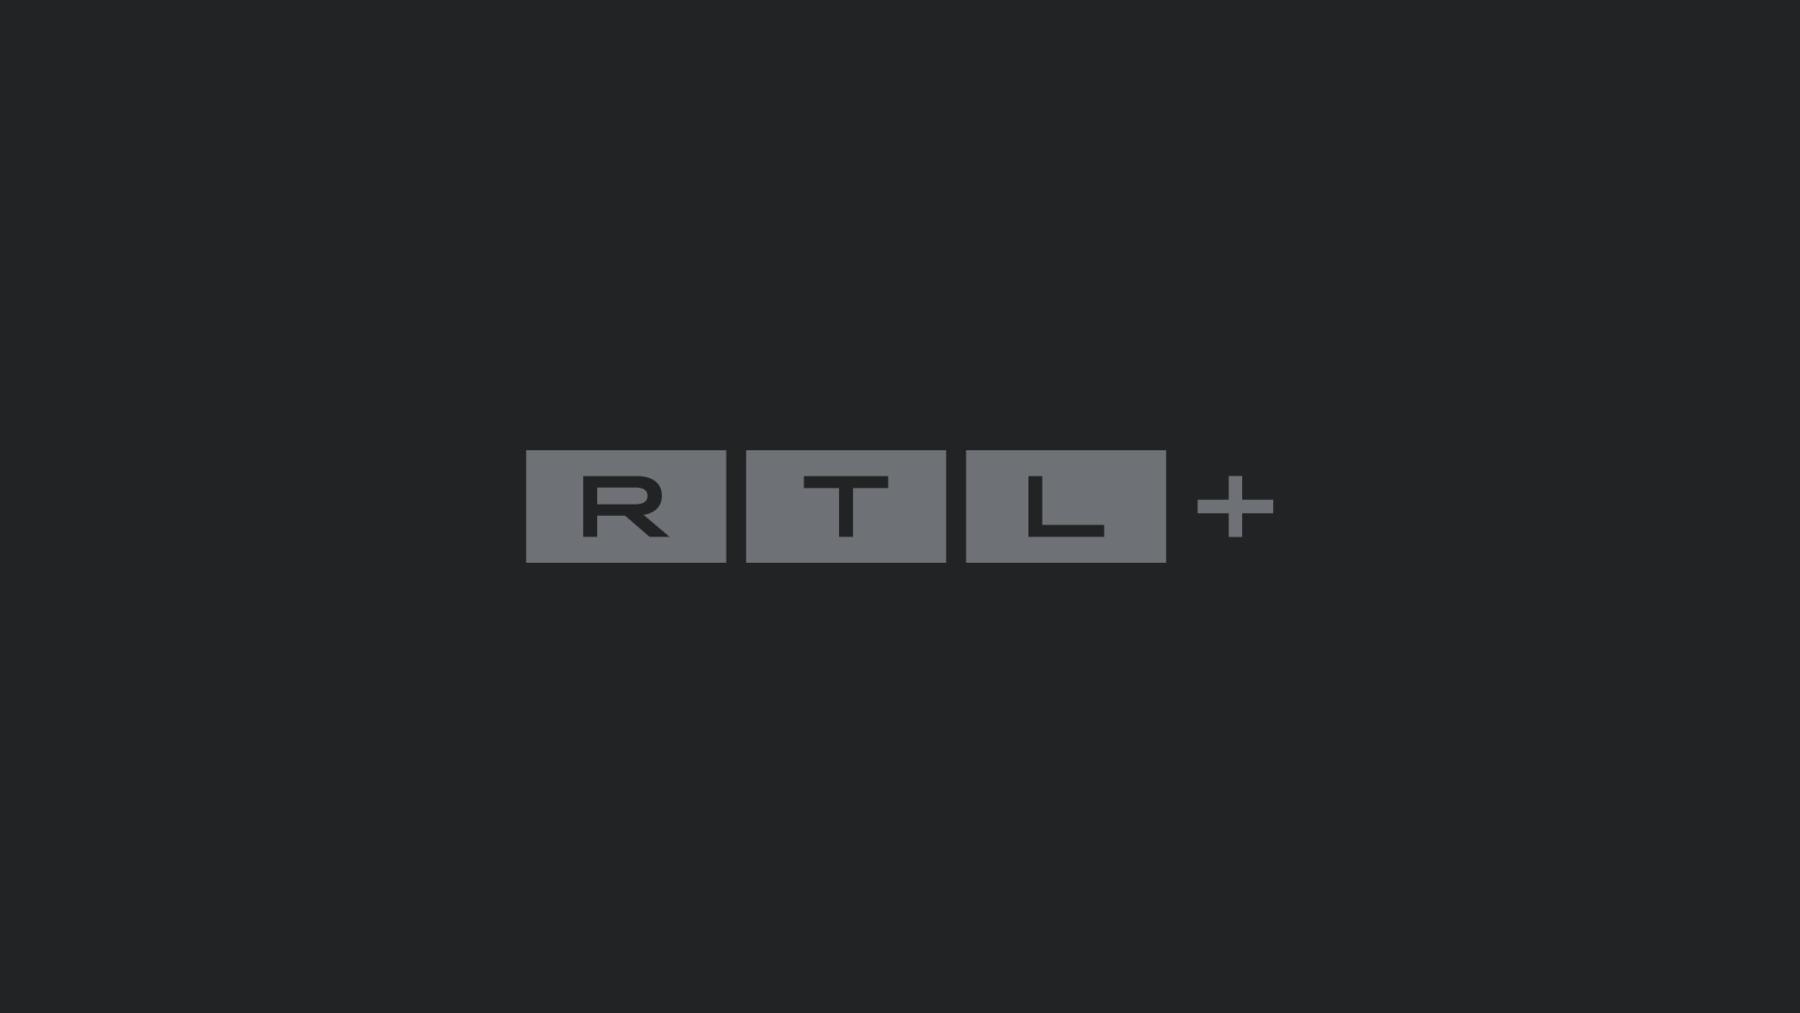 Thema u.a.: RTL WEST Sommerplausch